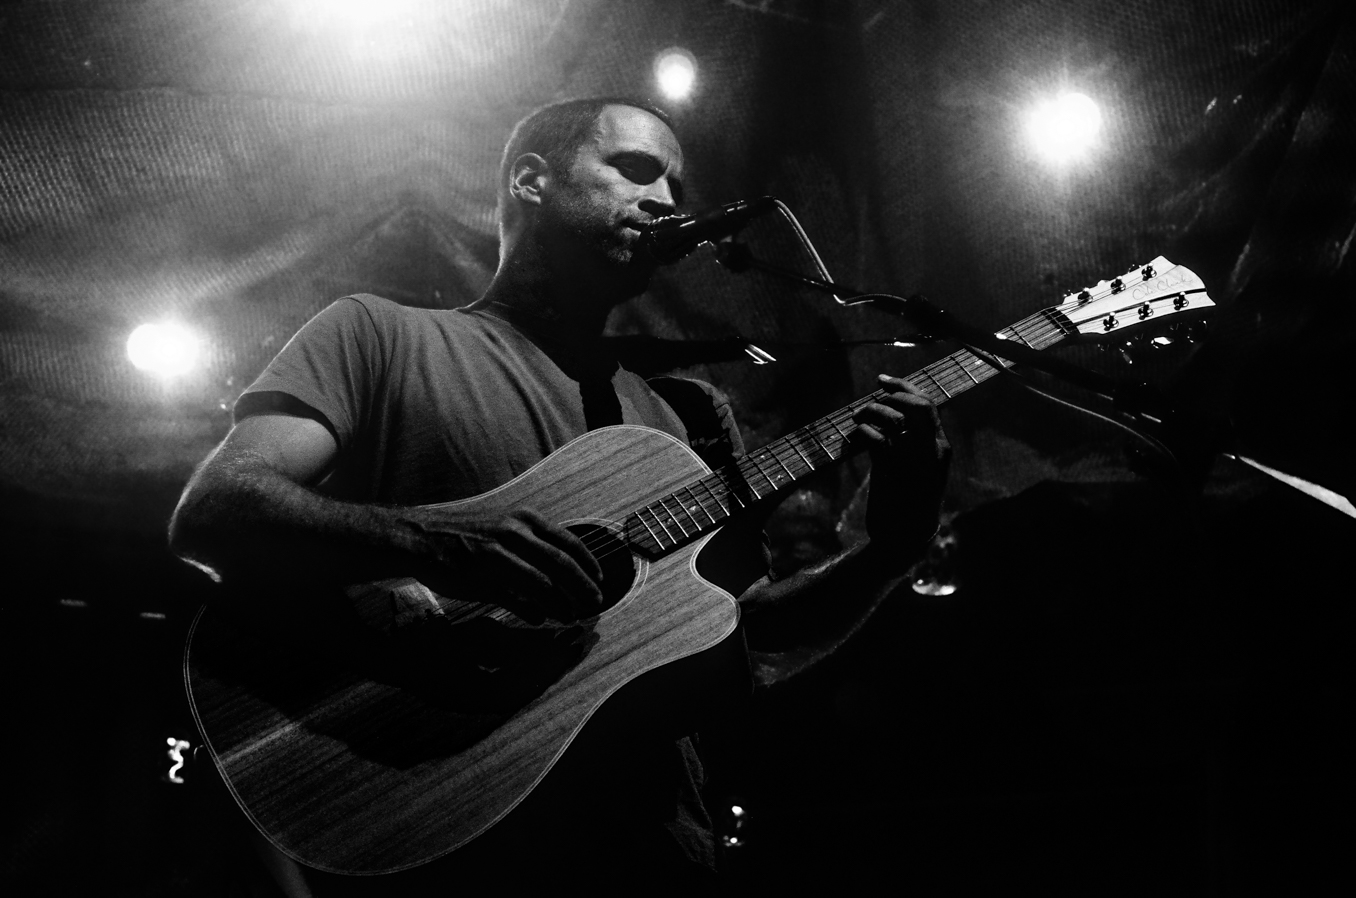 jack johnson live review melbourne photo credit ryley clarke savage thrills savagethrills 4